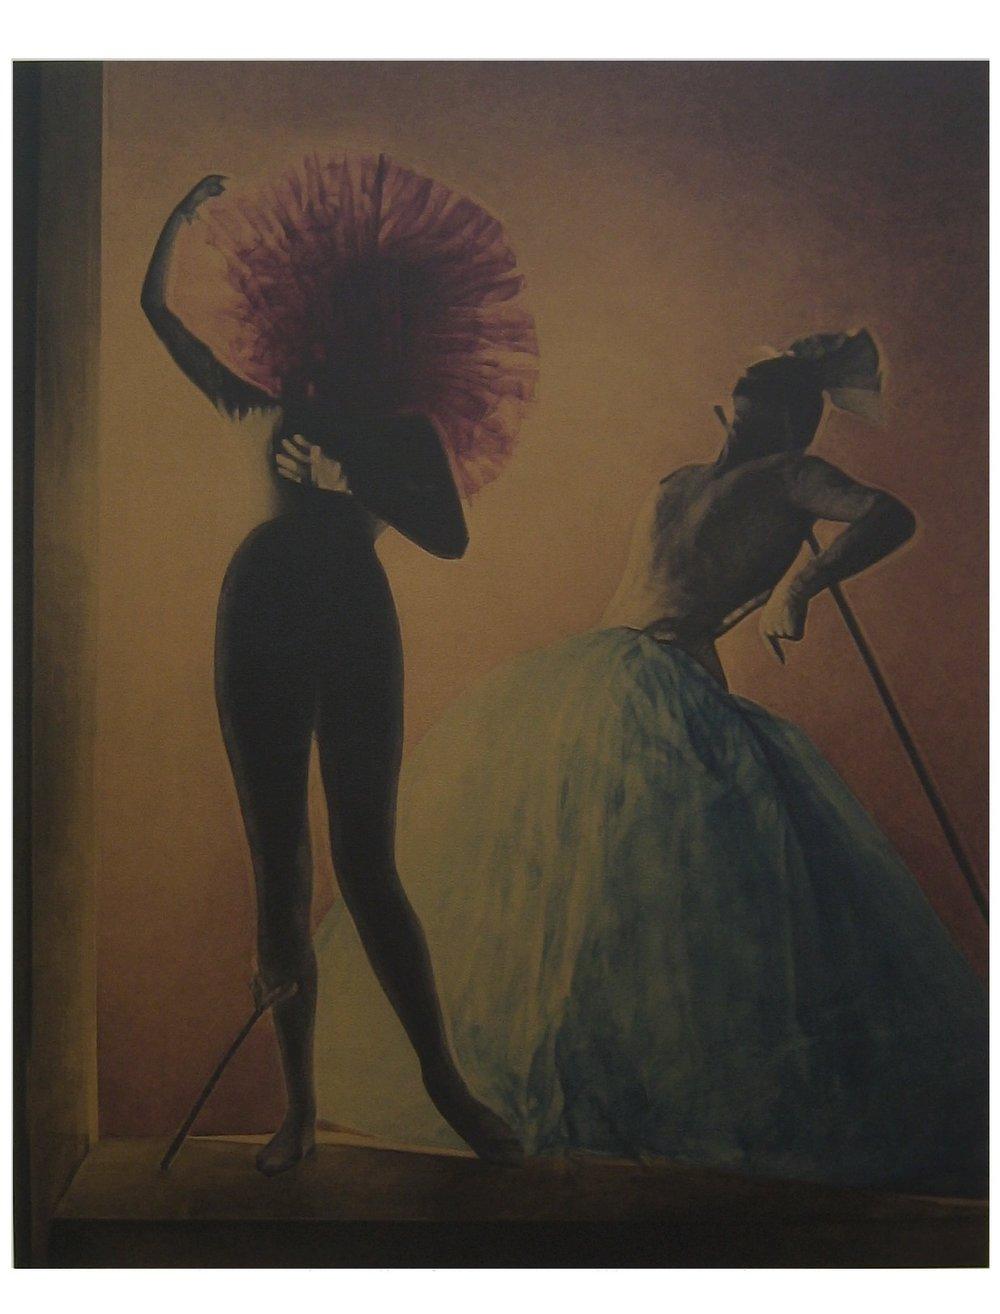 after Horst, Paris 1939    57x44,acrylic on canvas, 2006